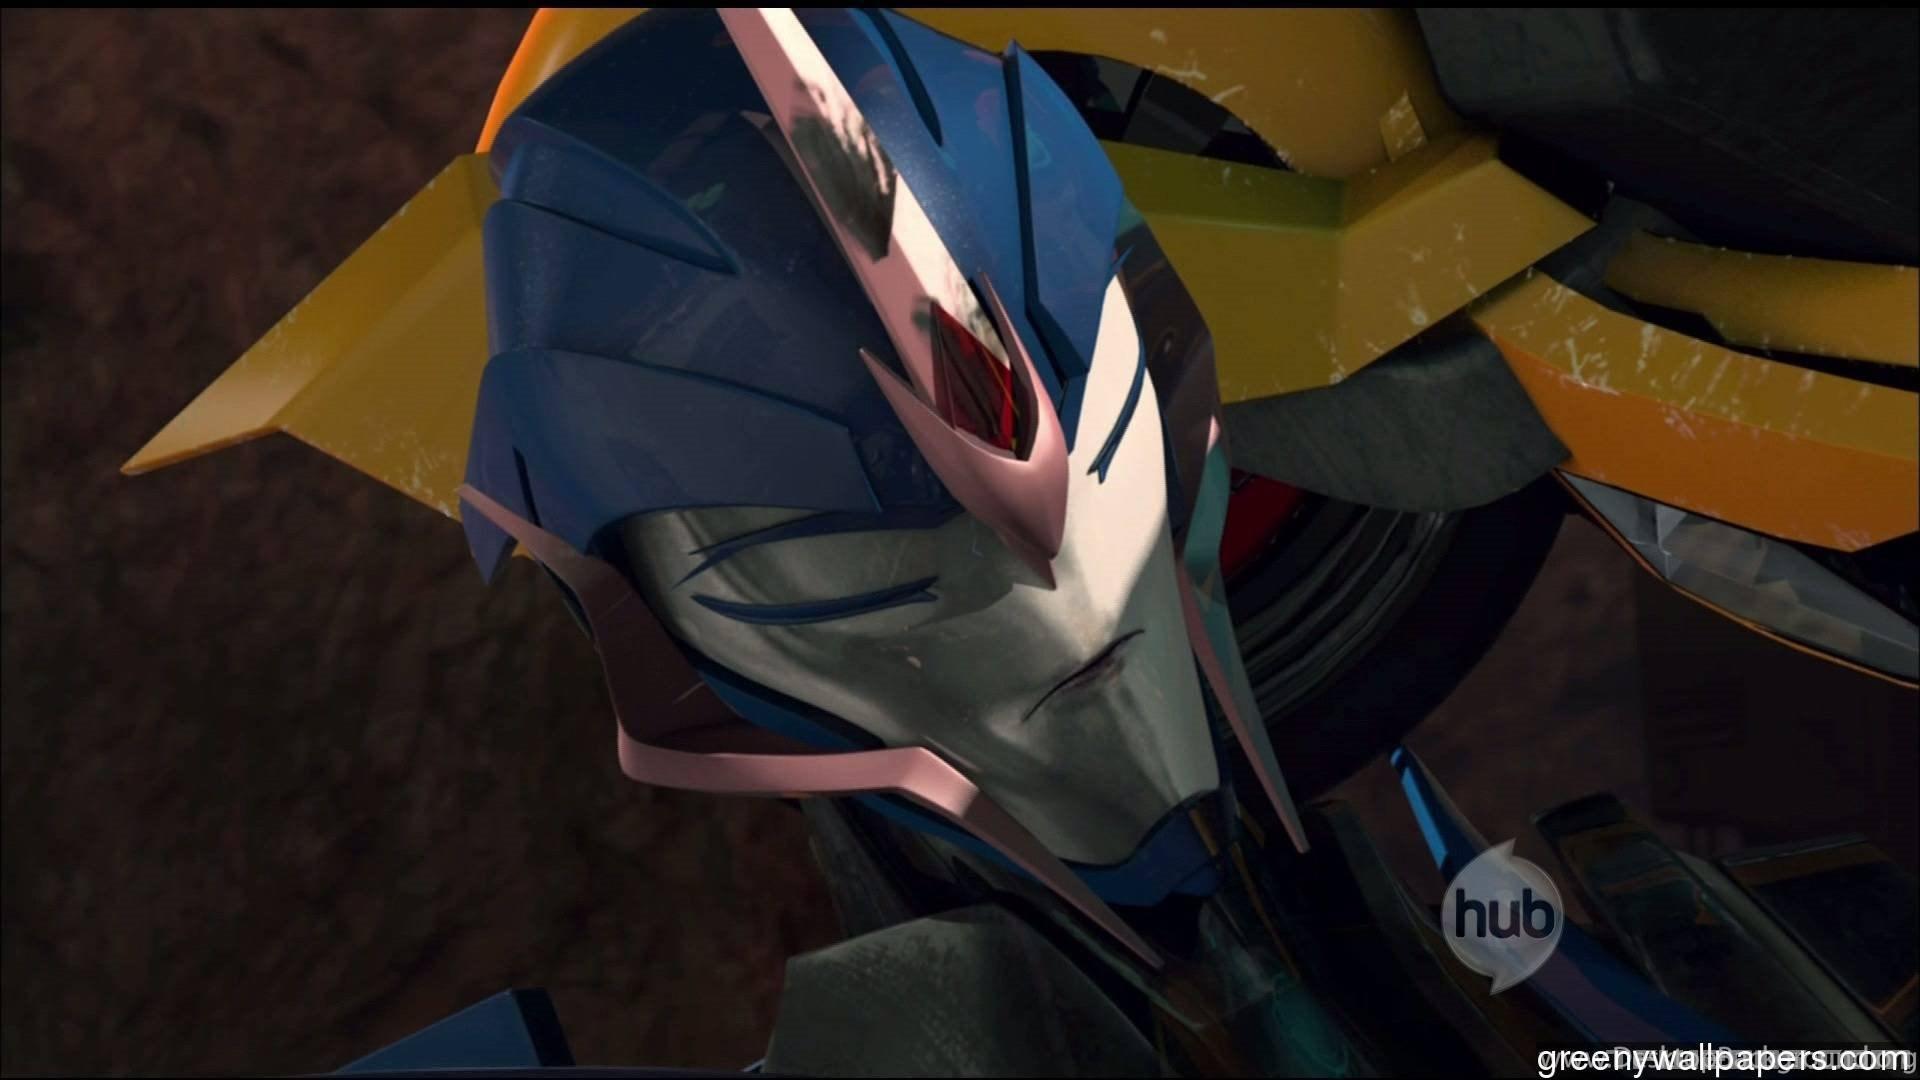 Transformers prime episode 1920x1080 wallpapers desktop background.